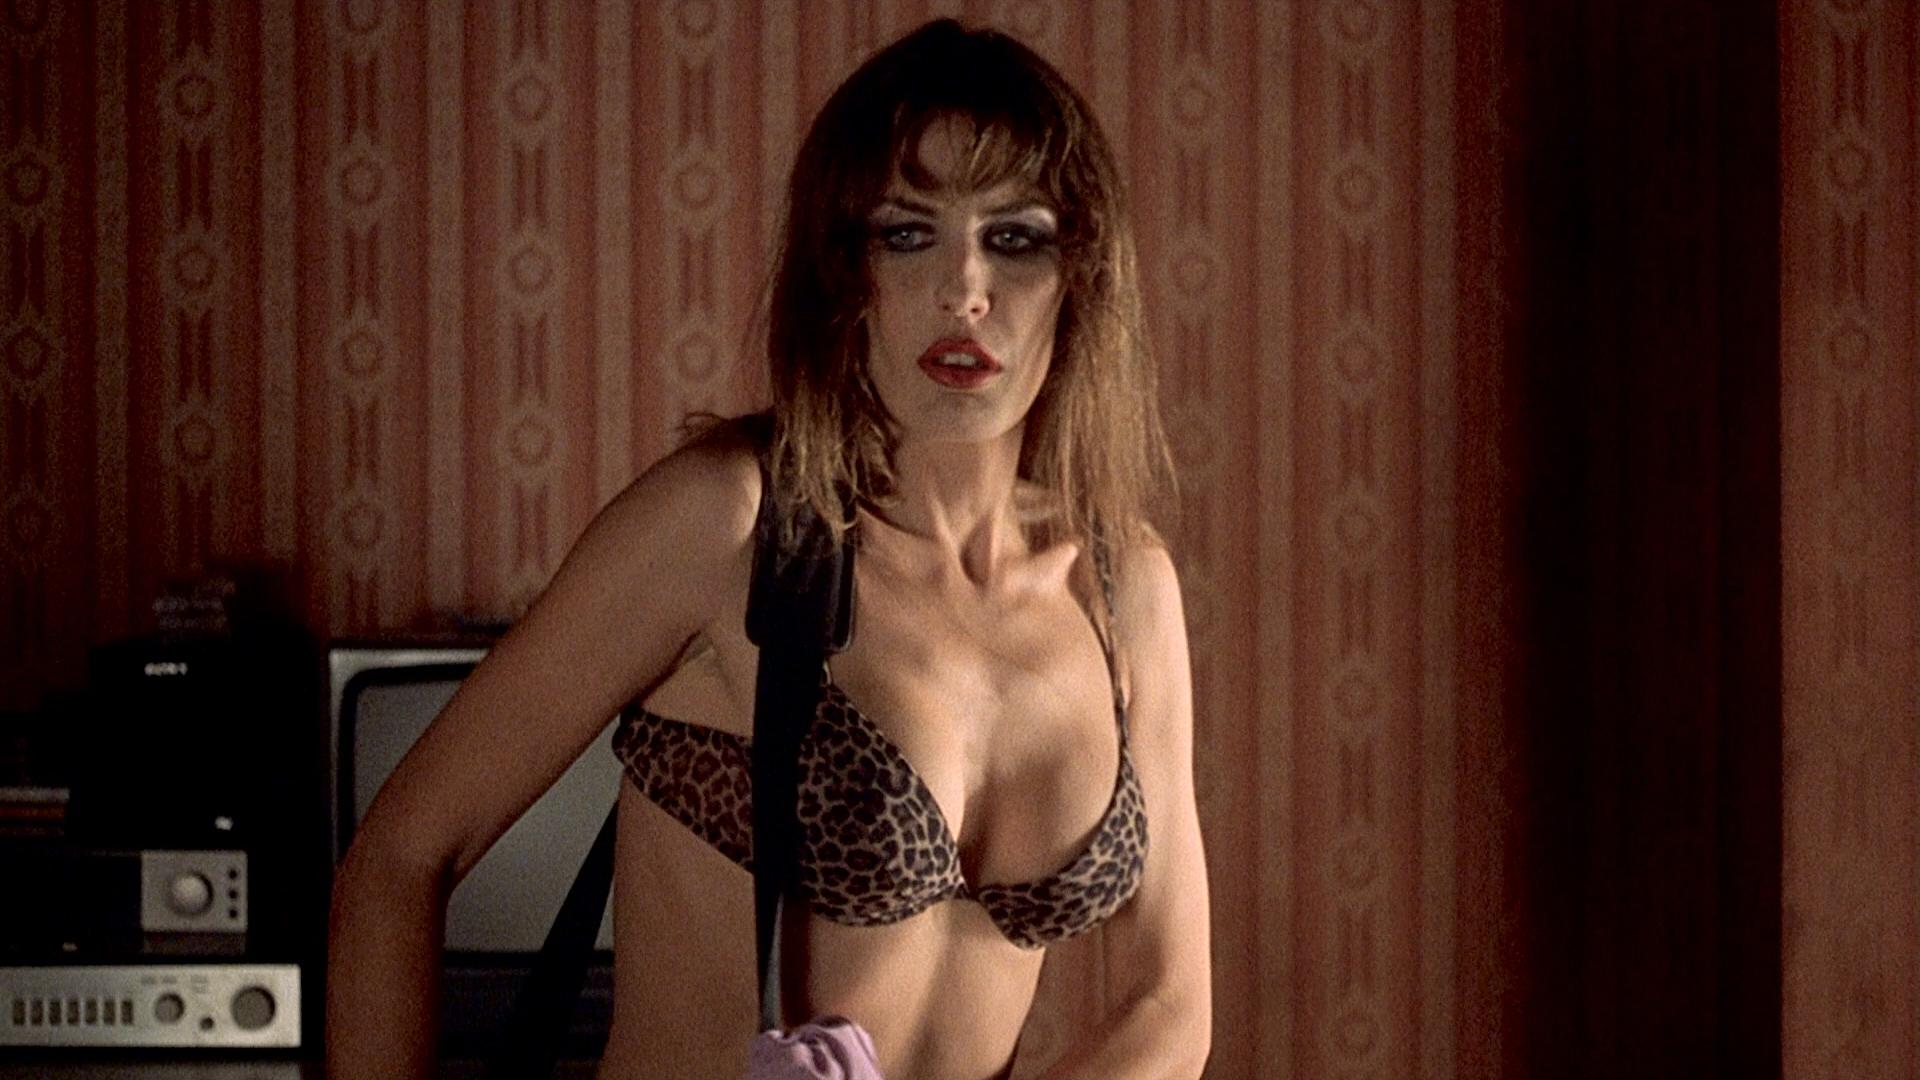 Barbara Lerici nude full frontal and Chiara Caselli nude briefly - Sleepless (IT-2001) HD 1080p (13)